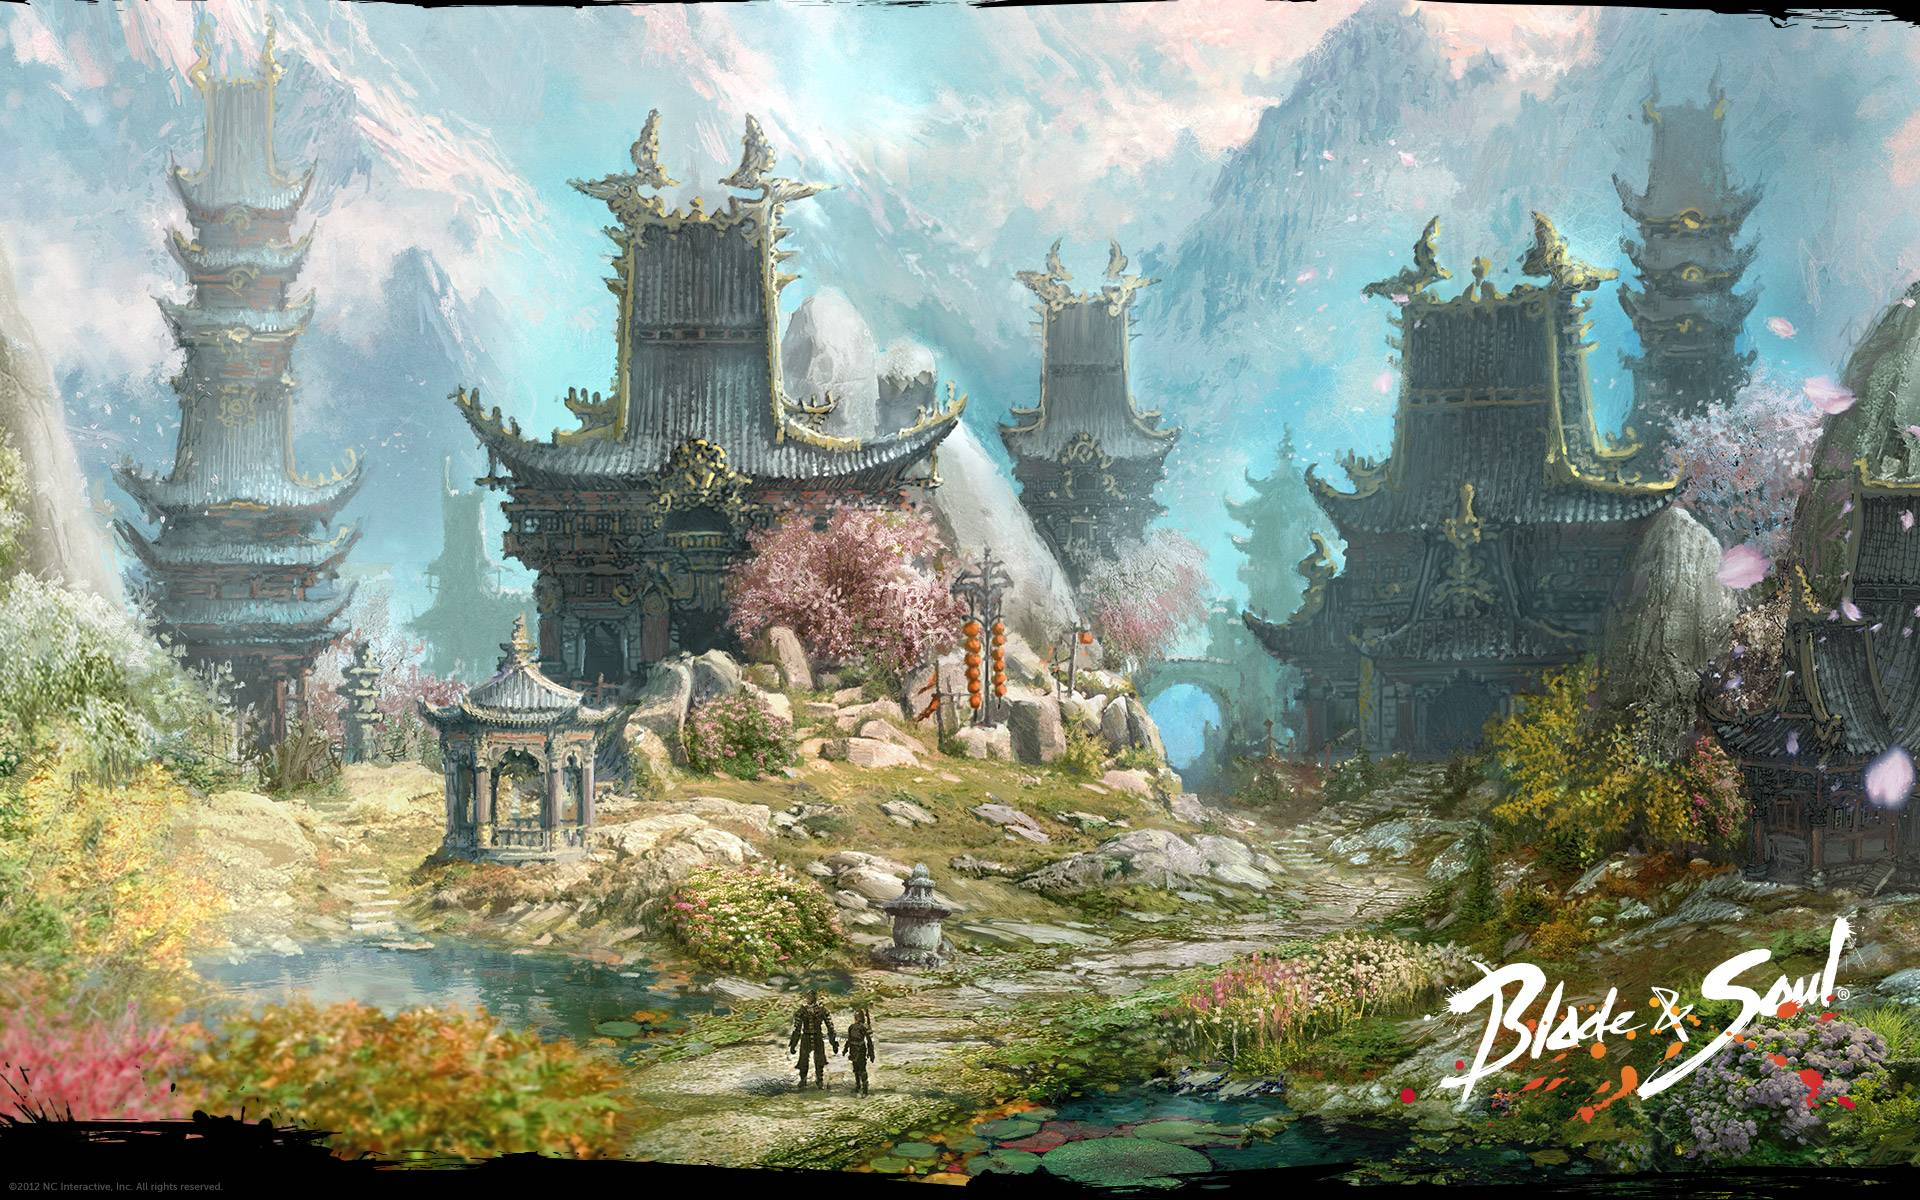 48+] Blade and Soul Wallpapers HD on WallpaperSafari